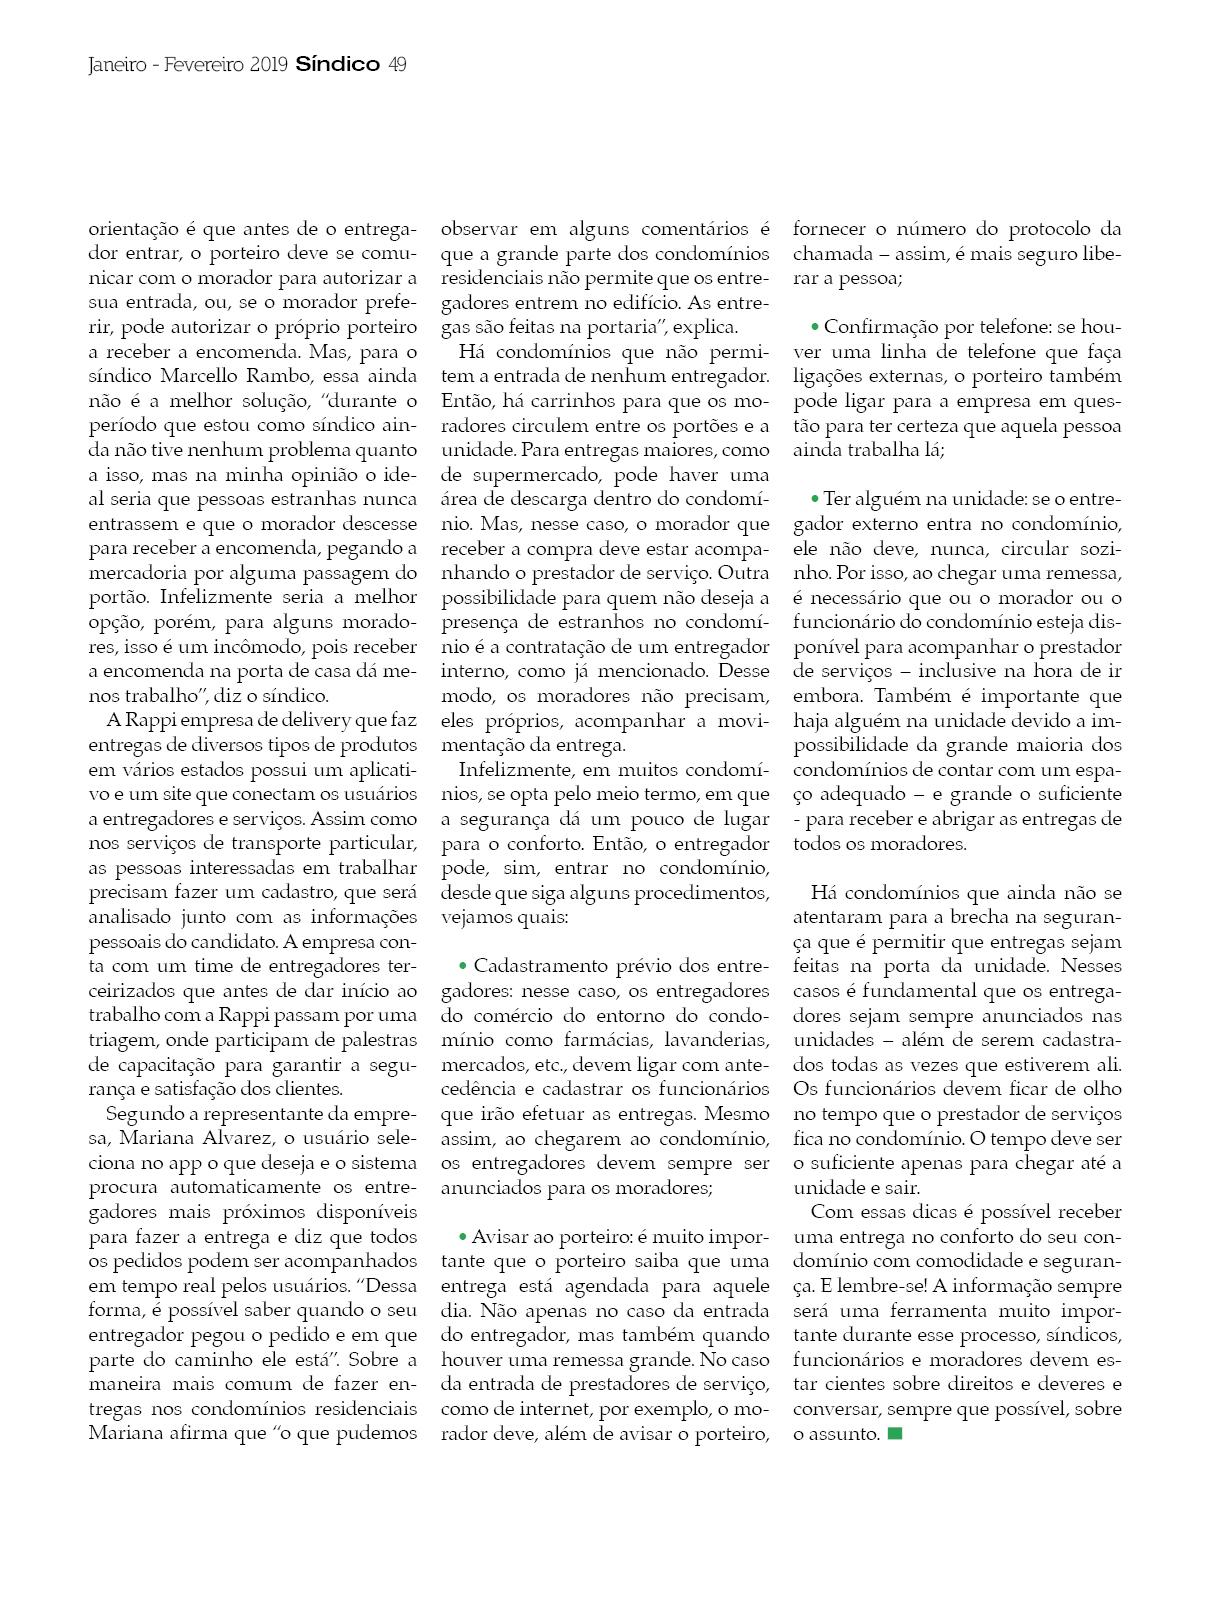 Revista Síndico_ed 242_47